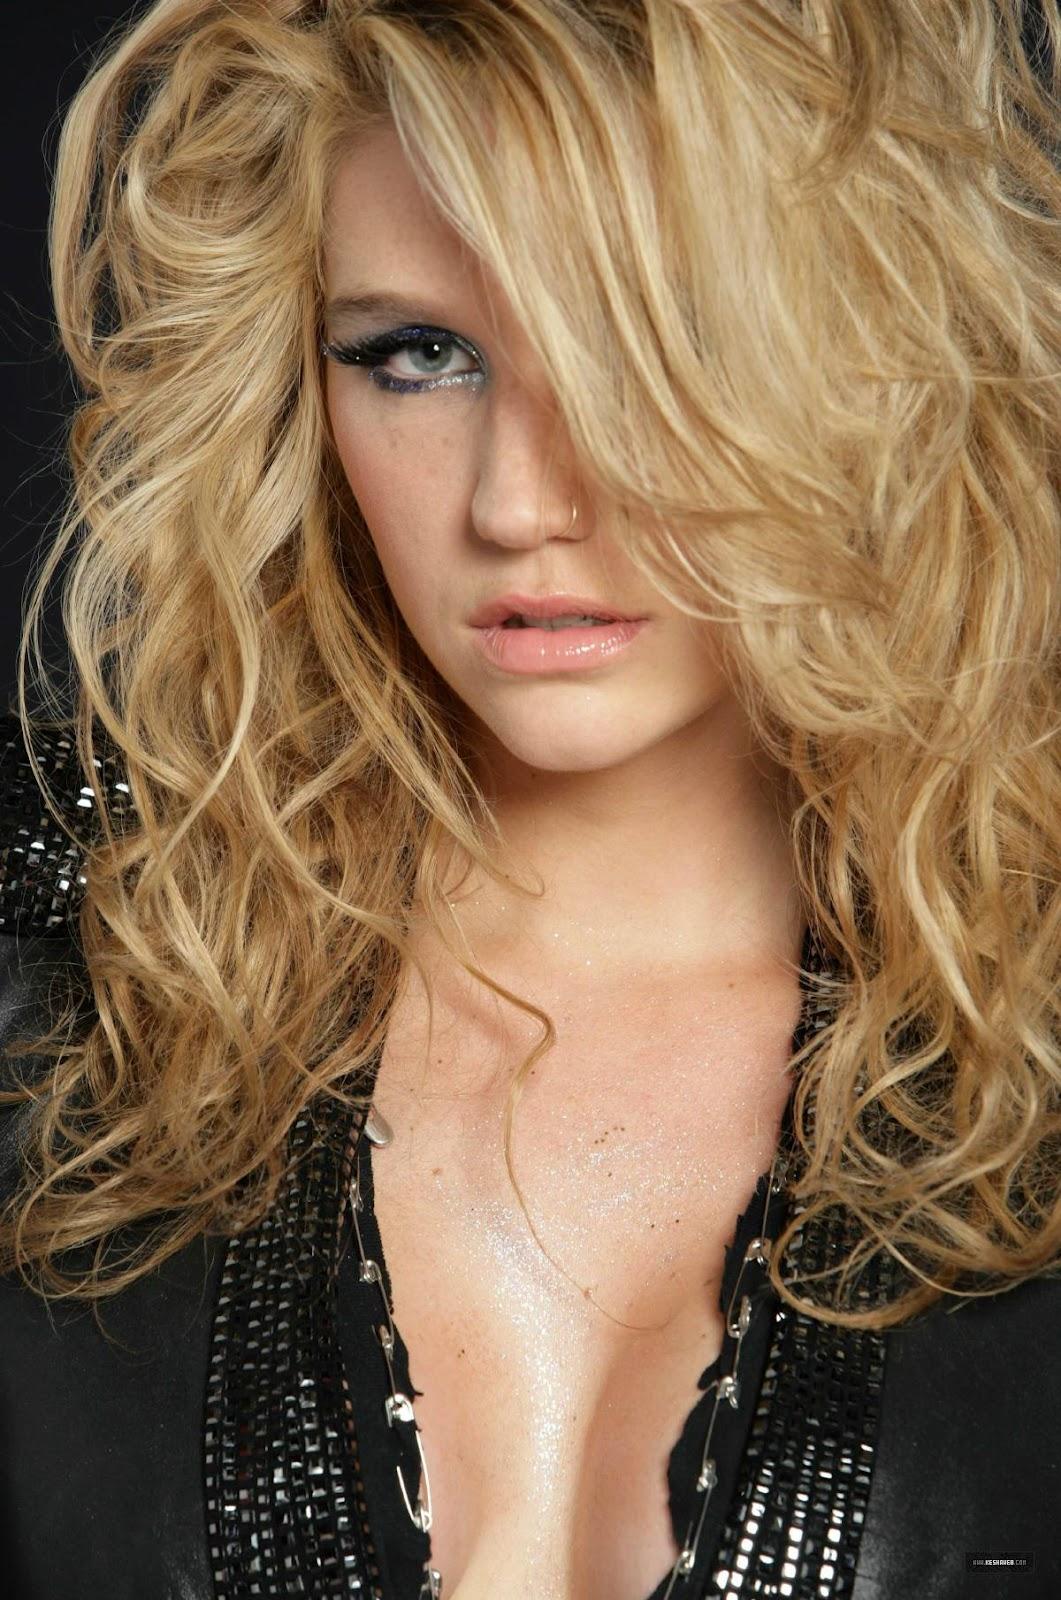 http://4.bp.blogspot.com/-bWAbyKLuckc/T1of3Z32SiI/AAAAAAAAB_o/sDgkmO4ML9w/s1600/Kesha-piccol.jpg